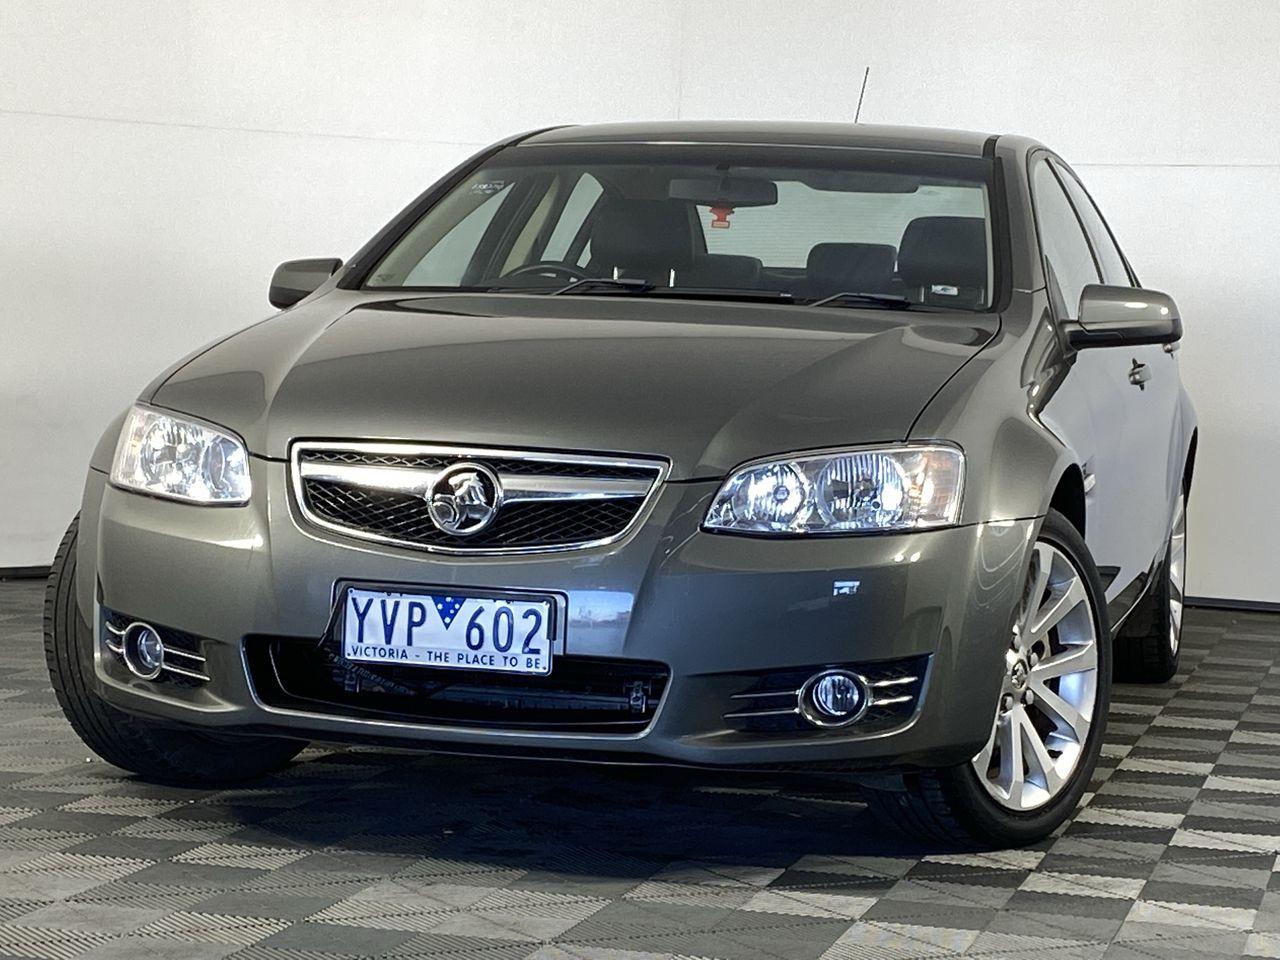 2011 Holden Commodore Equipe VE Automatic Sedan